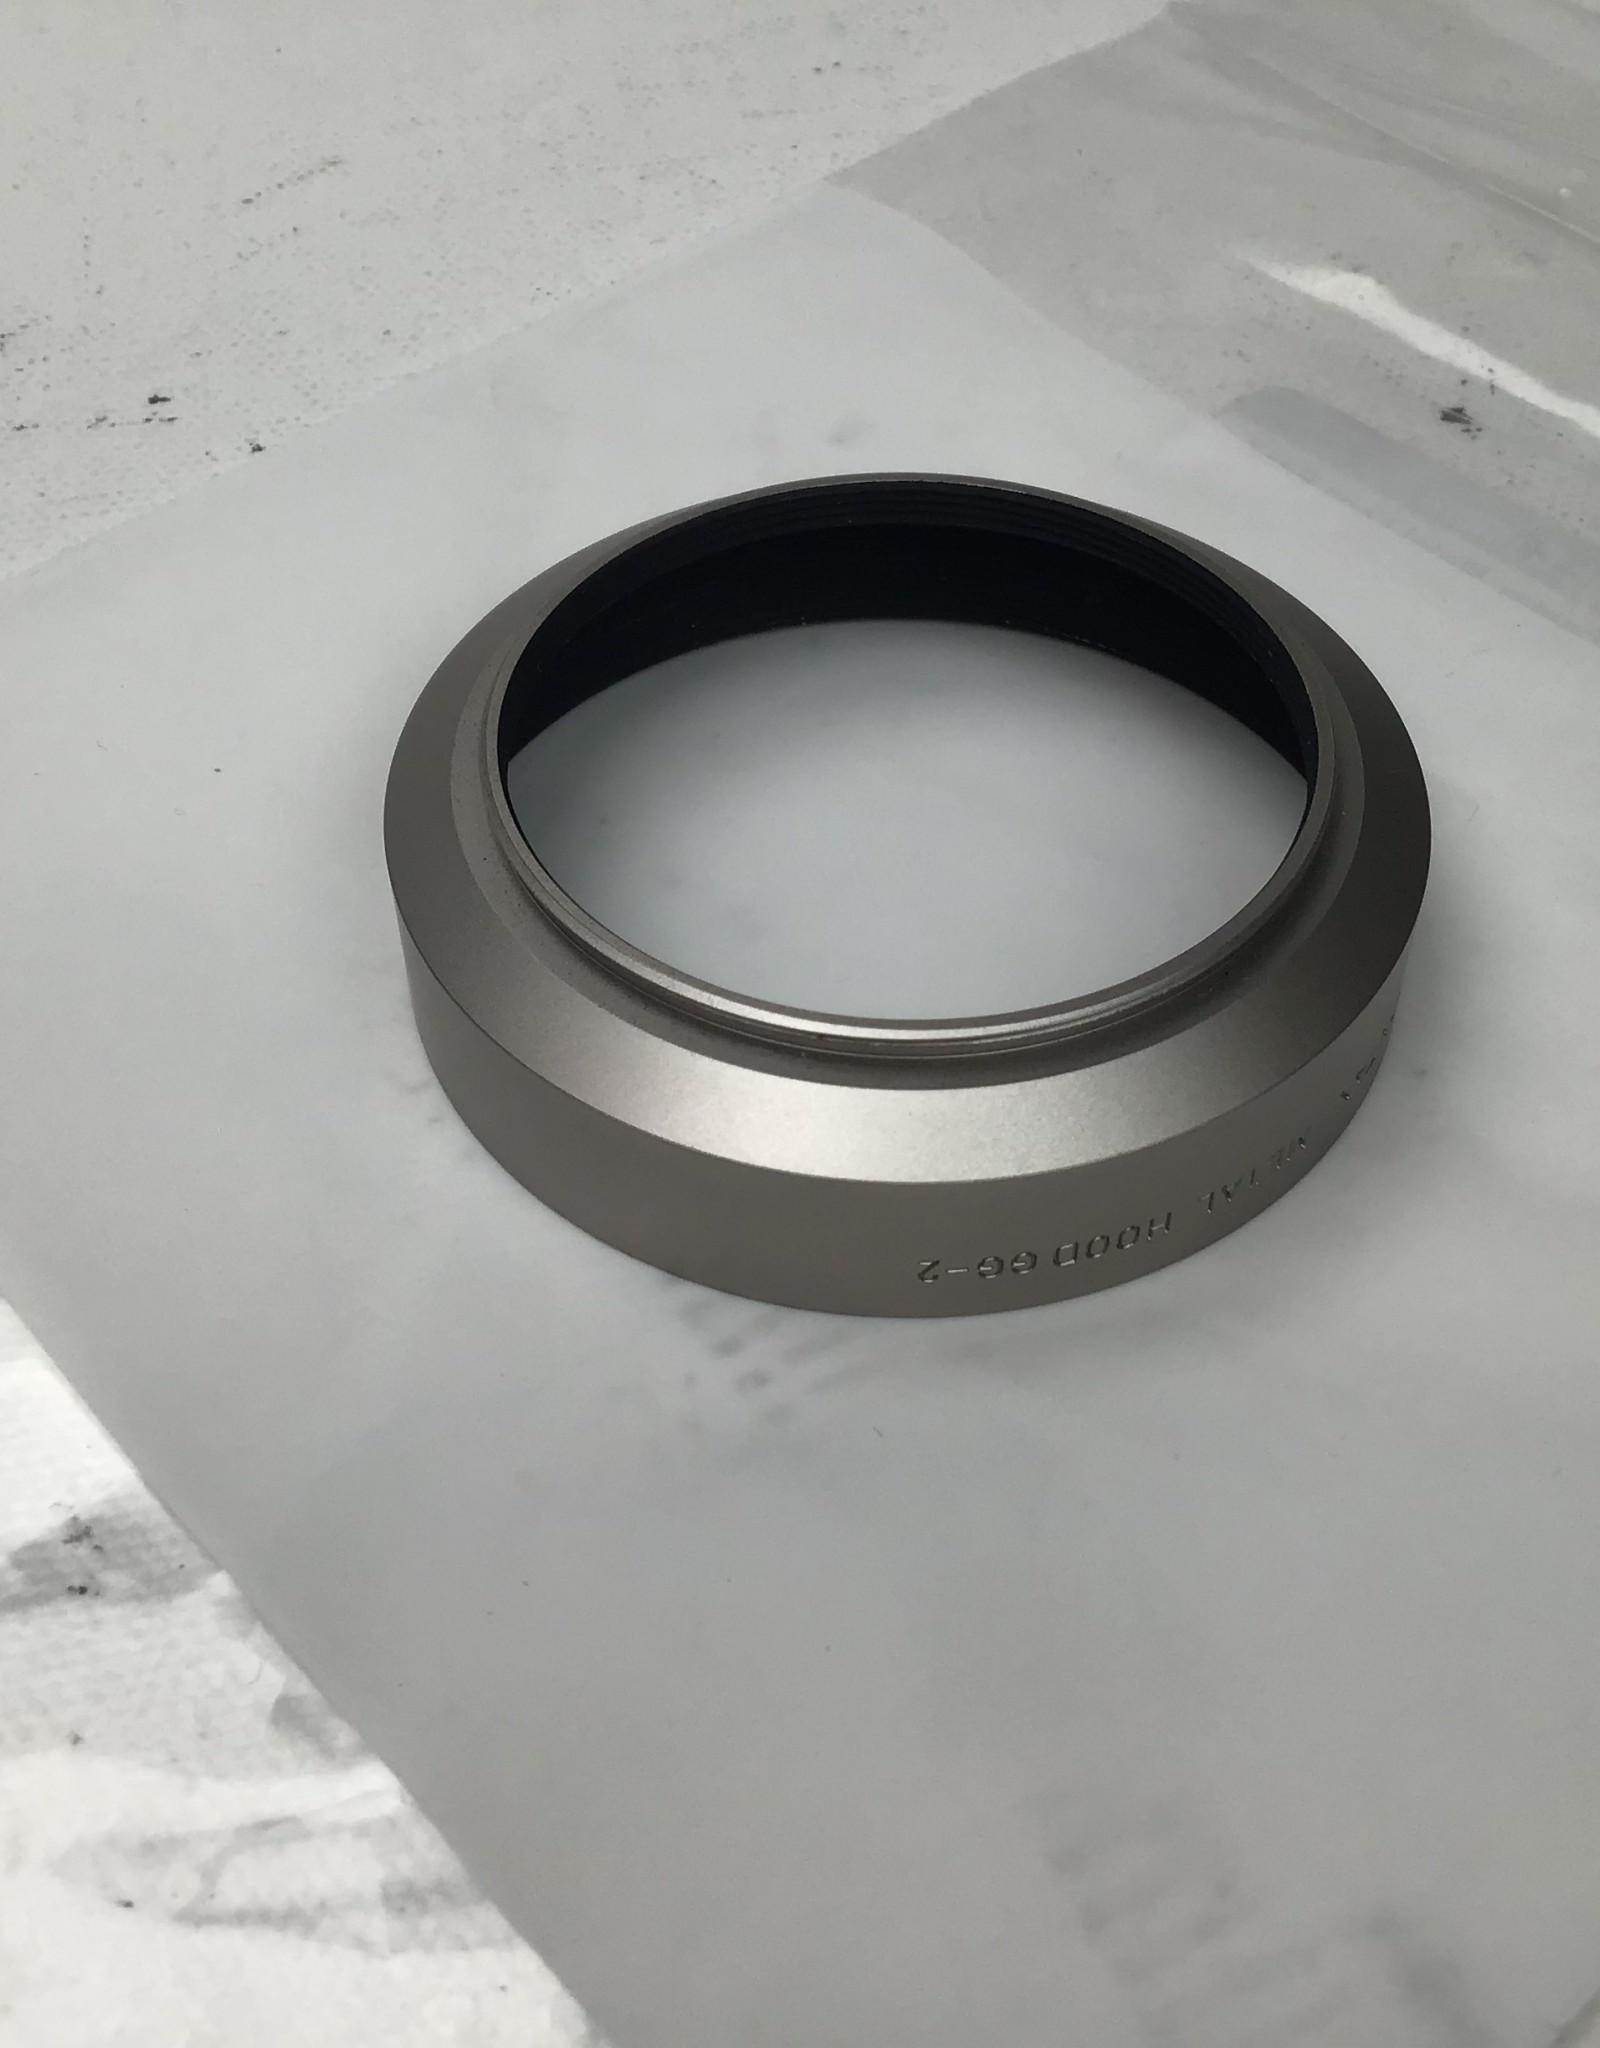 Contax Contax Metal Lens Hood GG-2 used EX